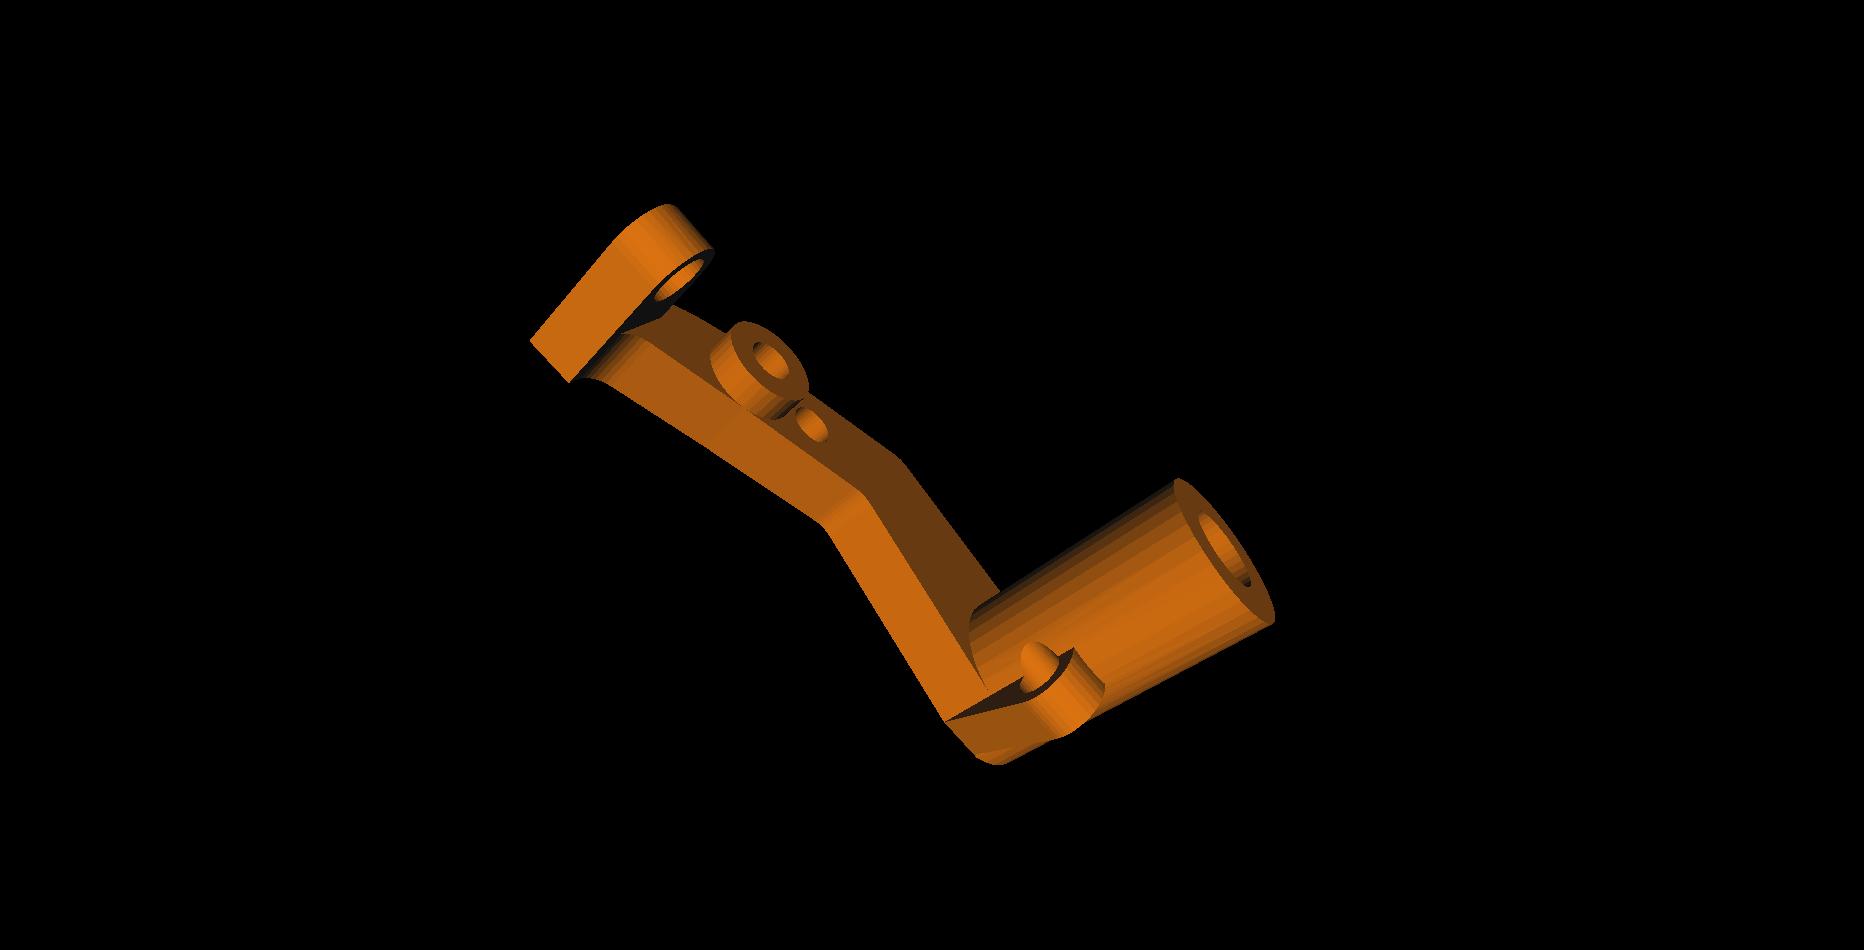 Tension Arm .stl file